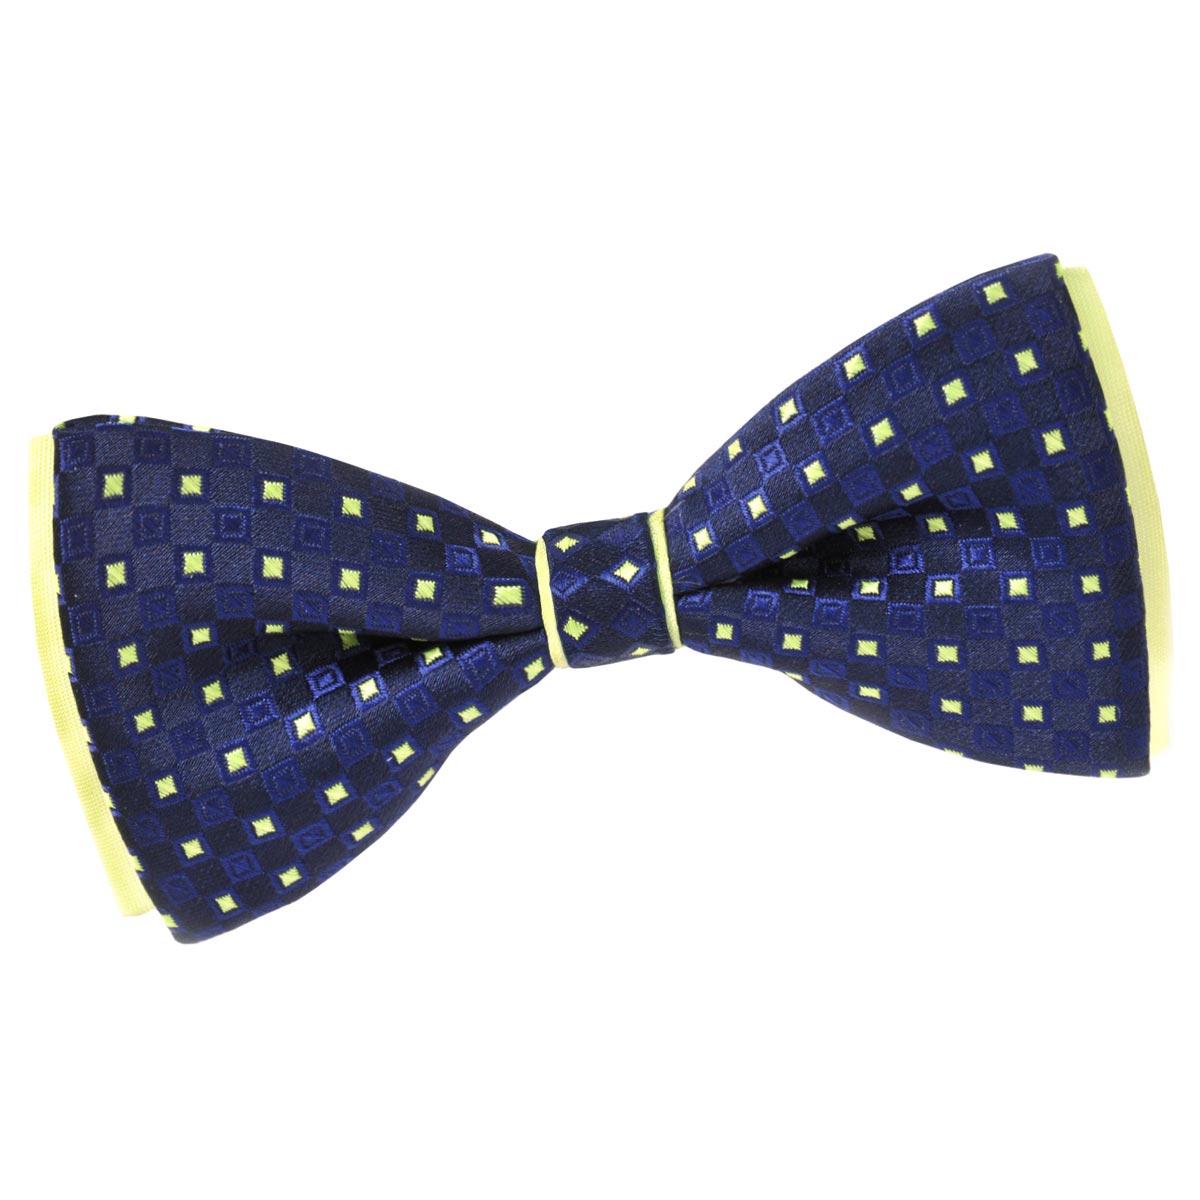 _Noeud-papillon-carreaux-jaune-bleu-marine